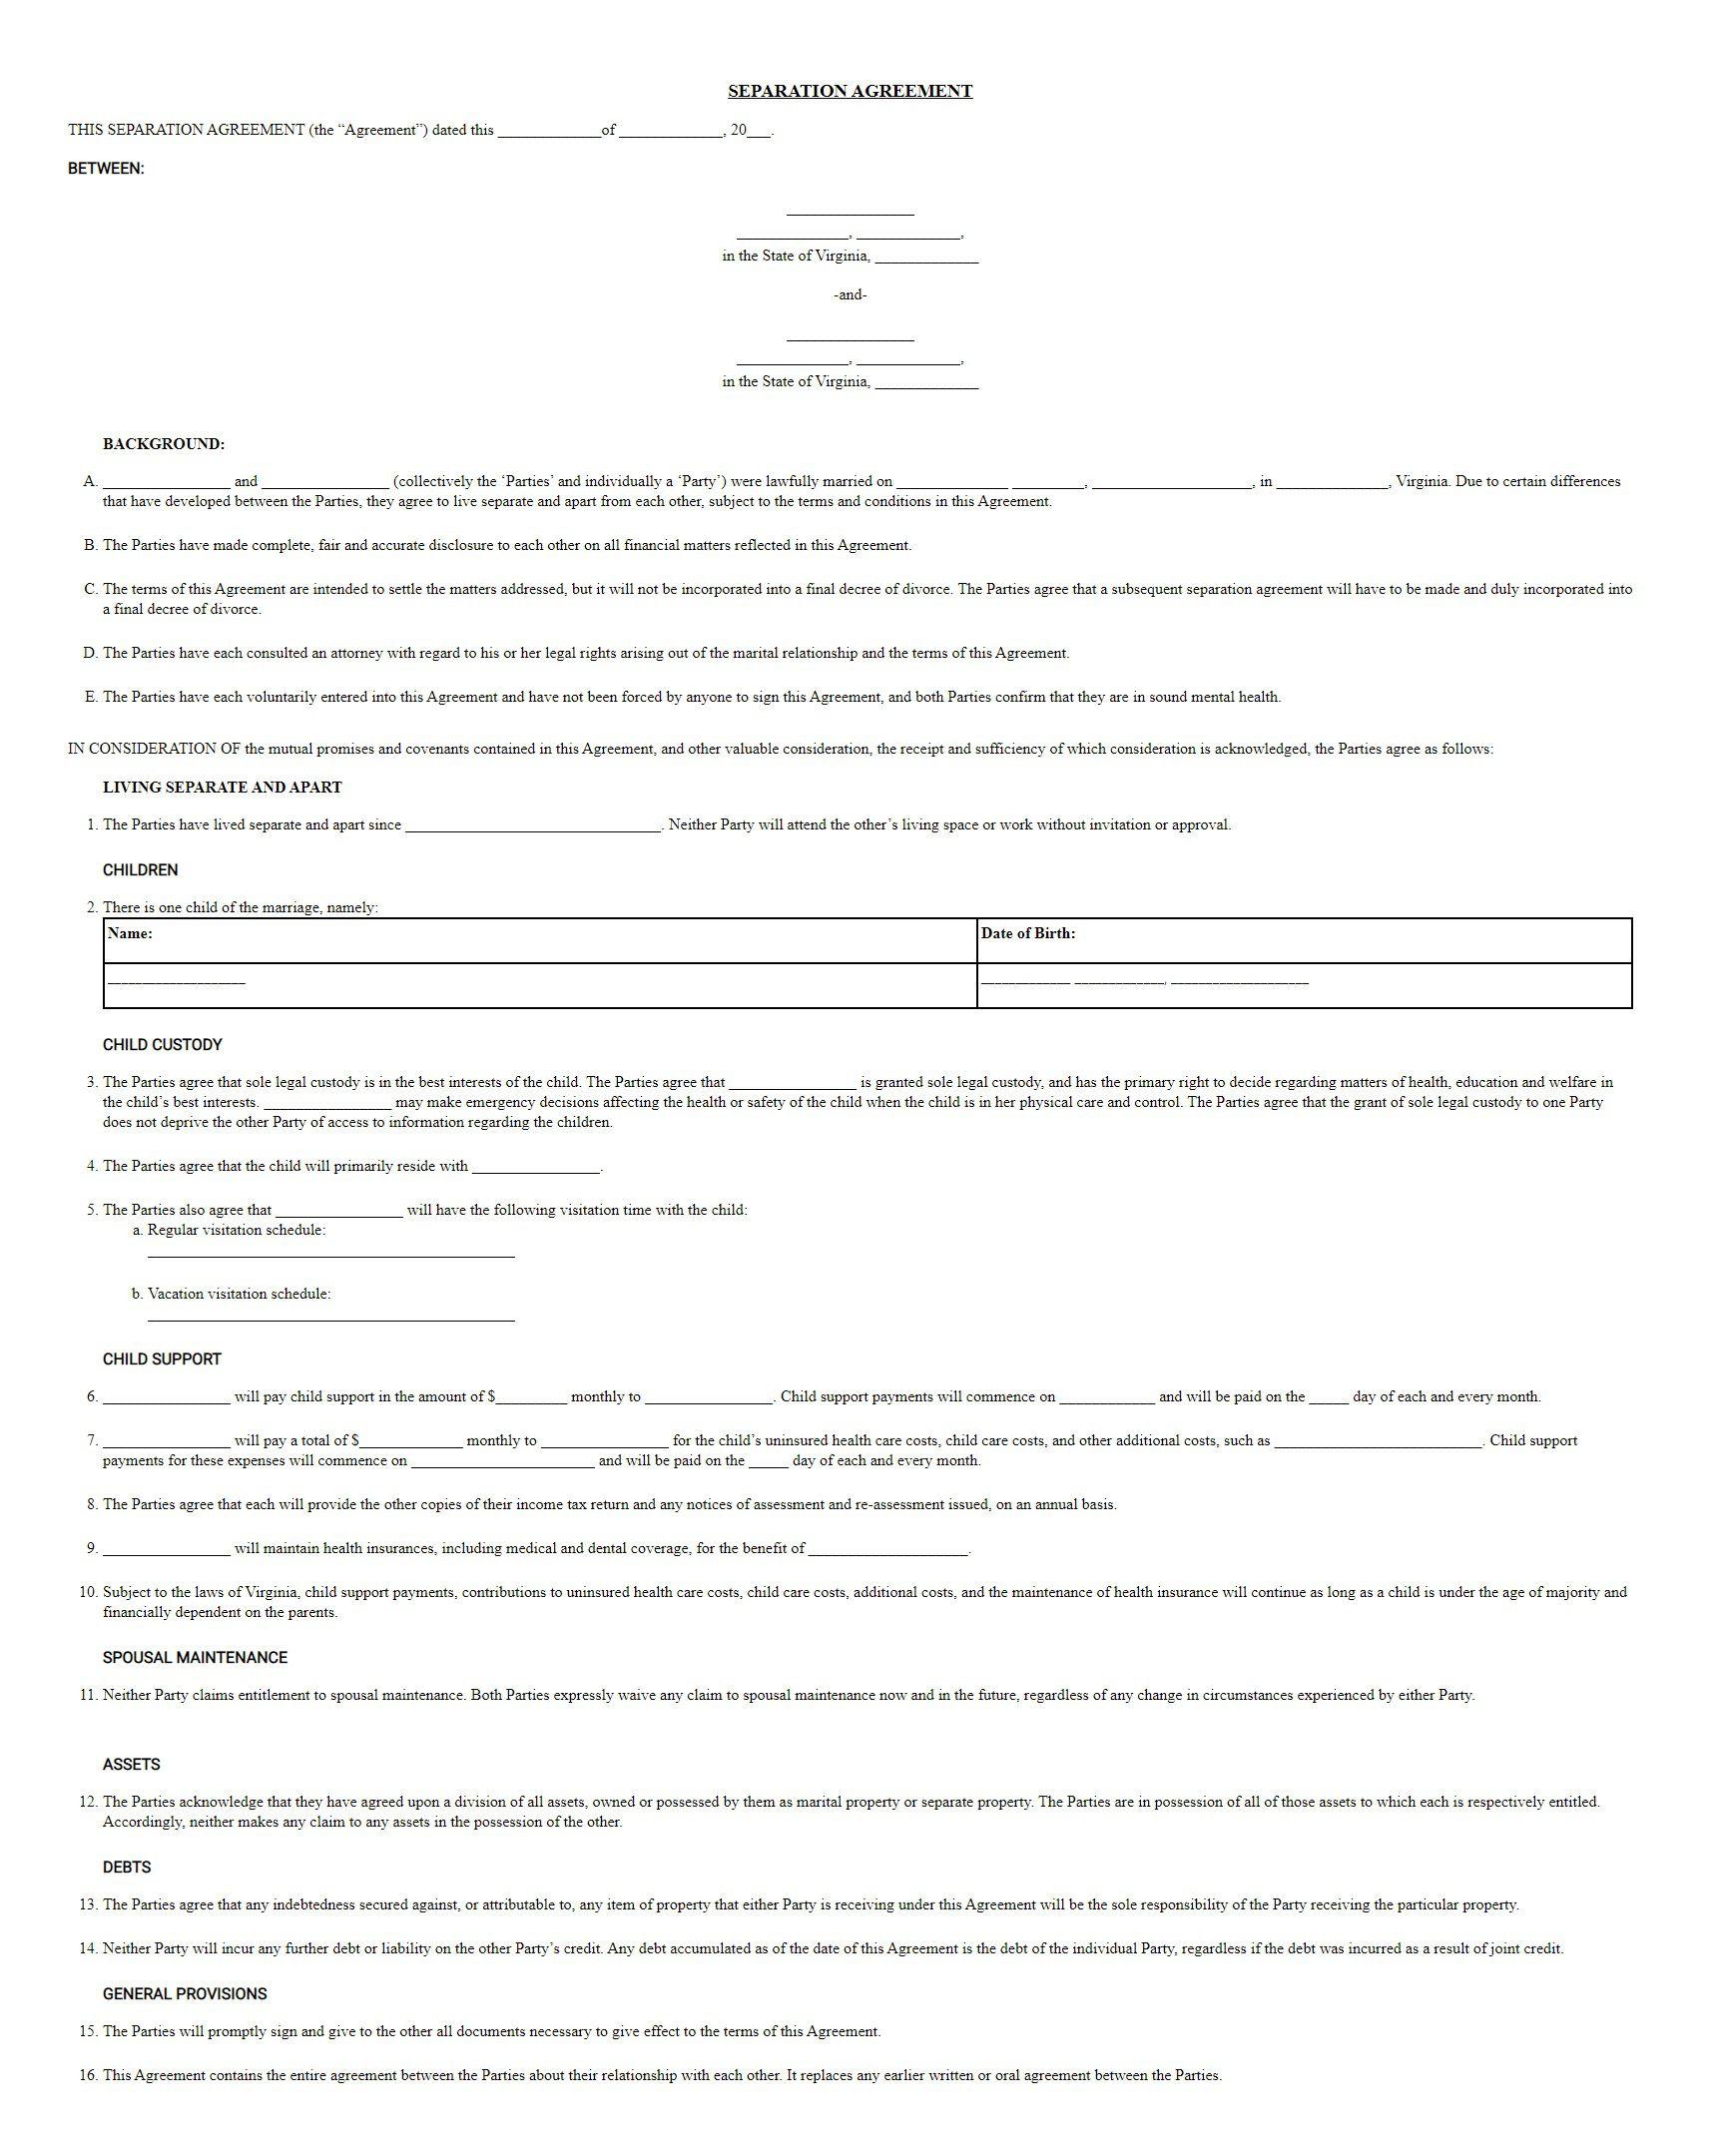 004 Astounding Virginia Separation Agreement Template Inspiration  Marital MarriageFull